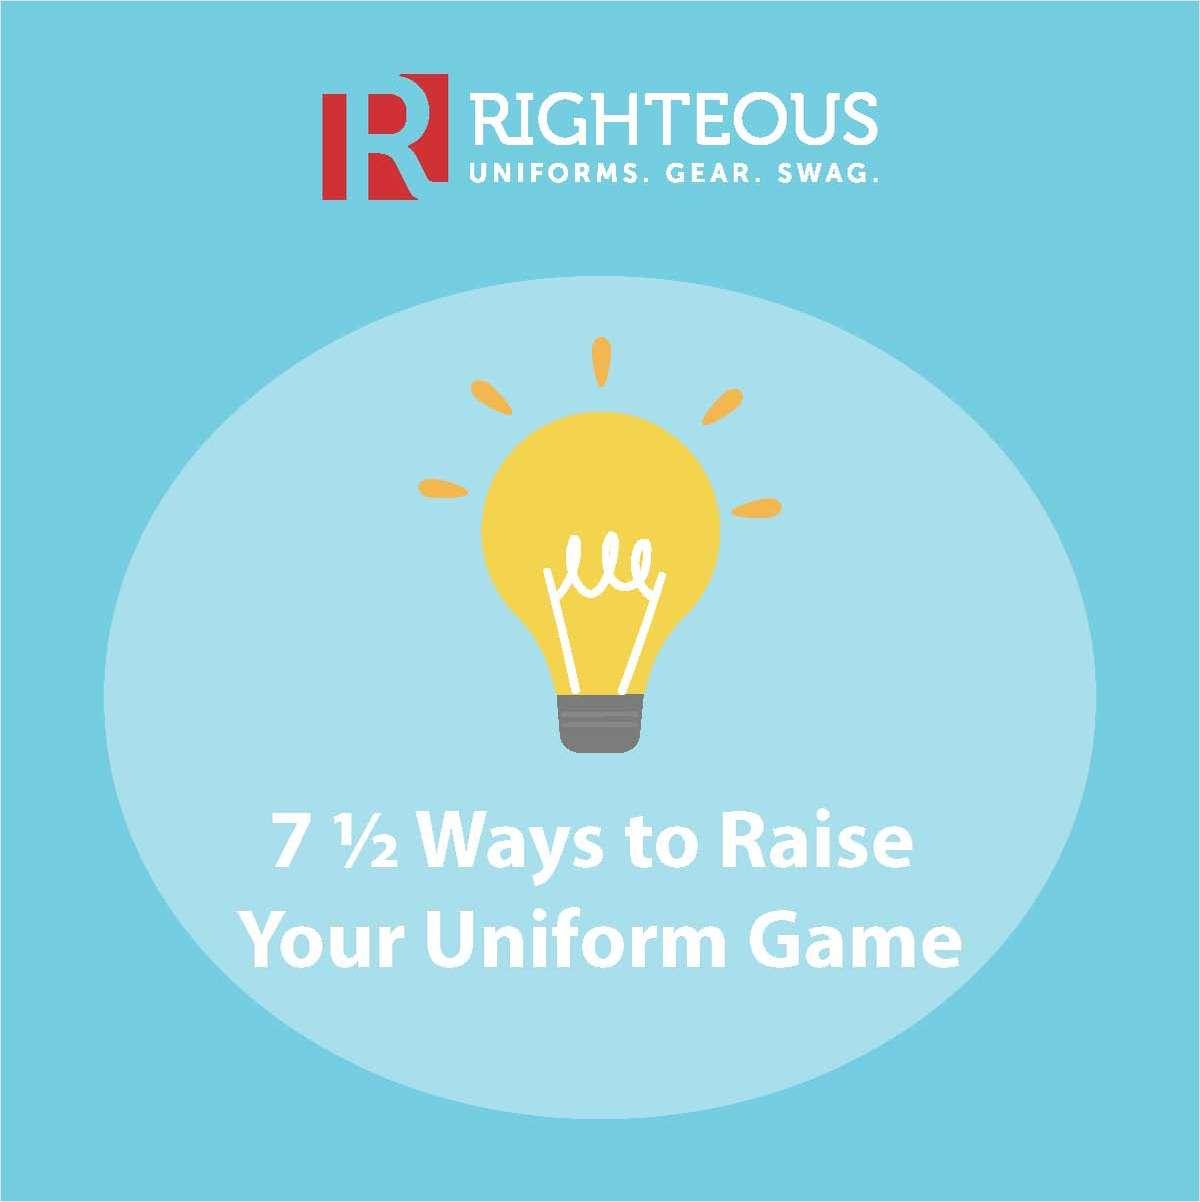 7 ½ Ways to Raise Your Uniform Game